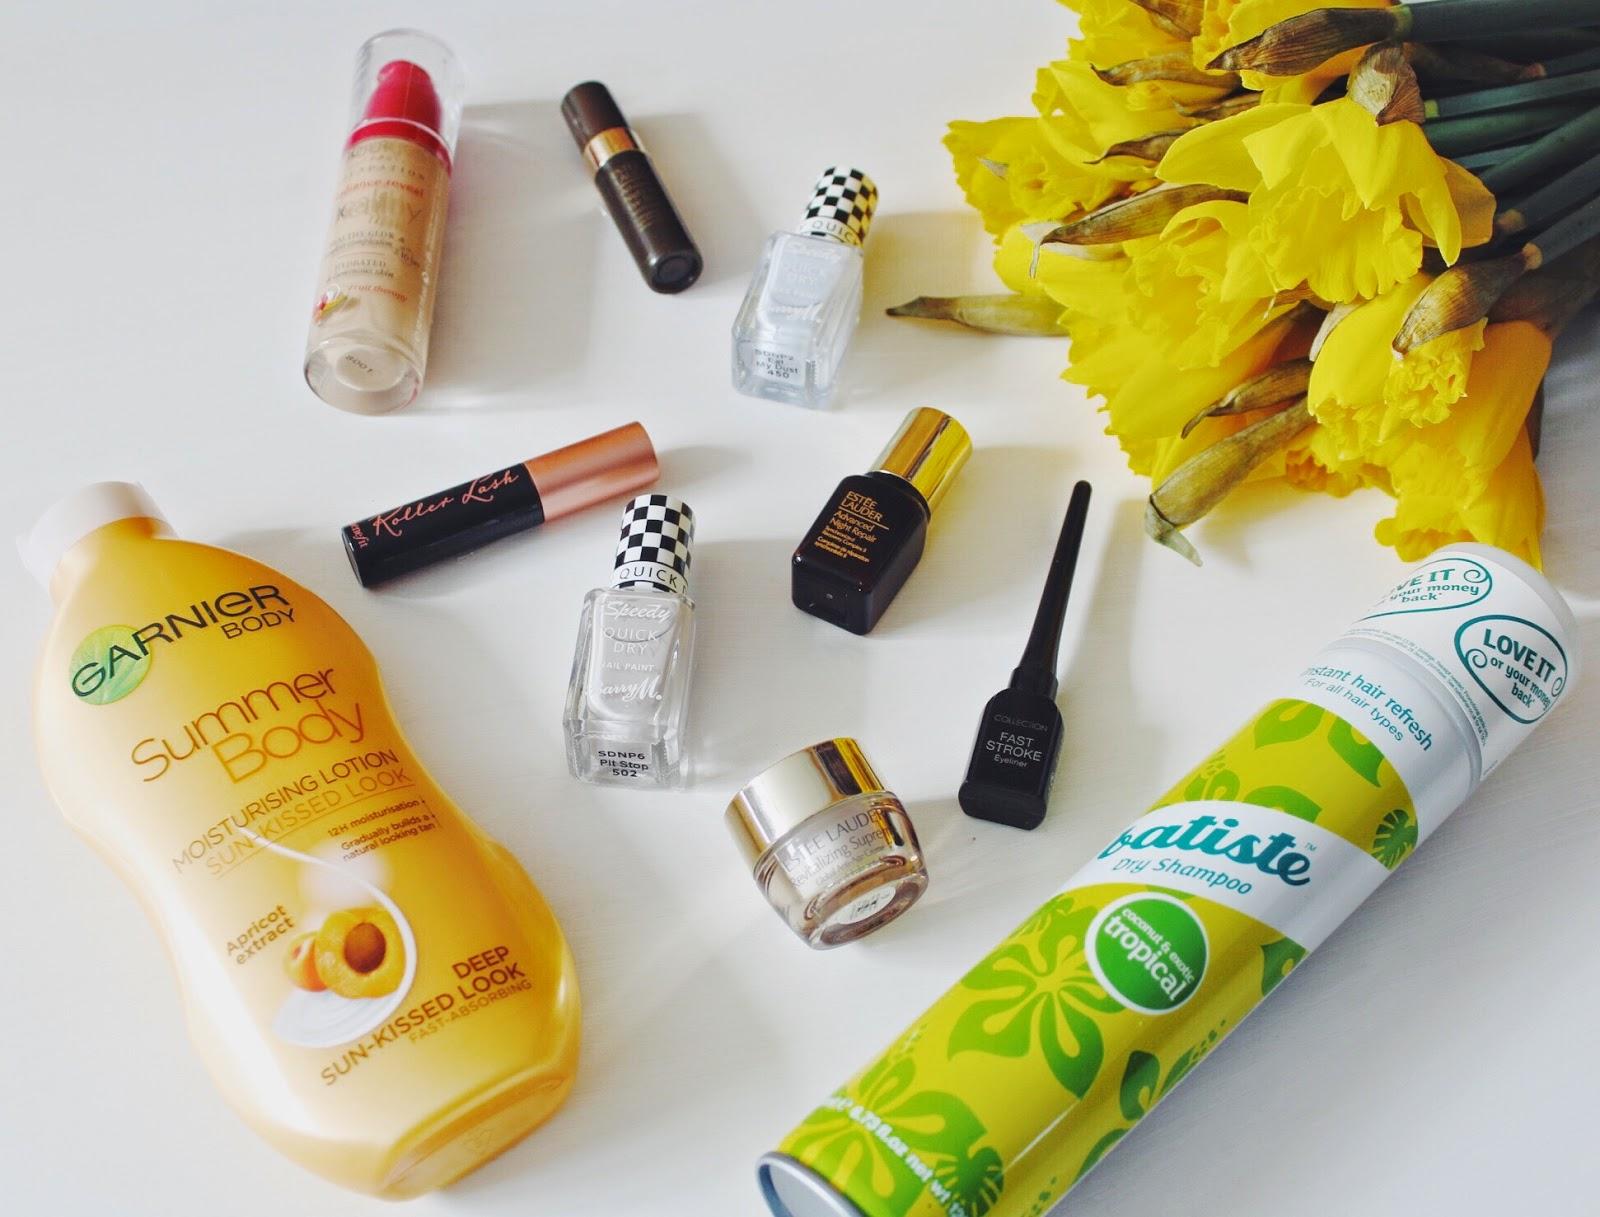 fbloggers, halcyonvelvet, bbloggers, beauty, beautybloggers, makeup, summerbody, garnier, esteelauder, batiste, dryshampoo, collection2000, eyeliner, barrym, nailvarnish, benefitrollerlash